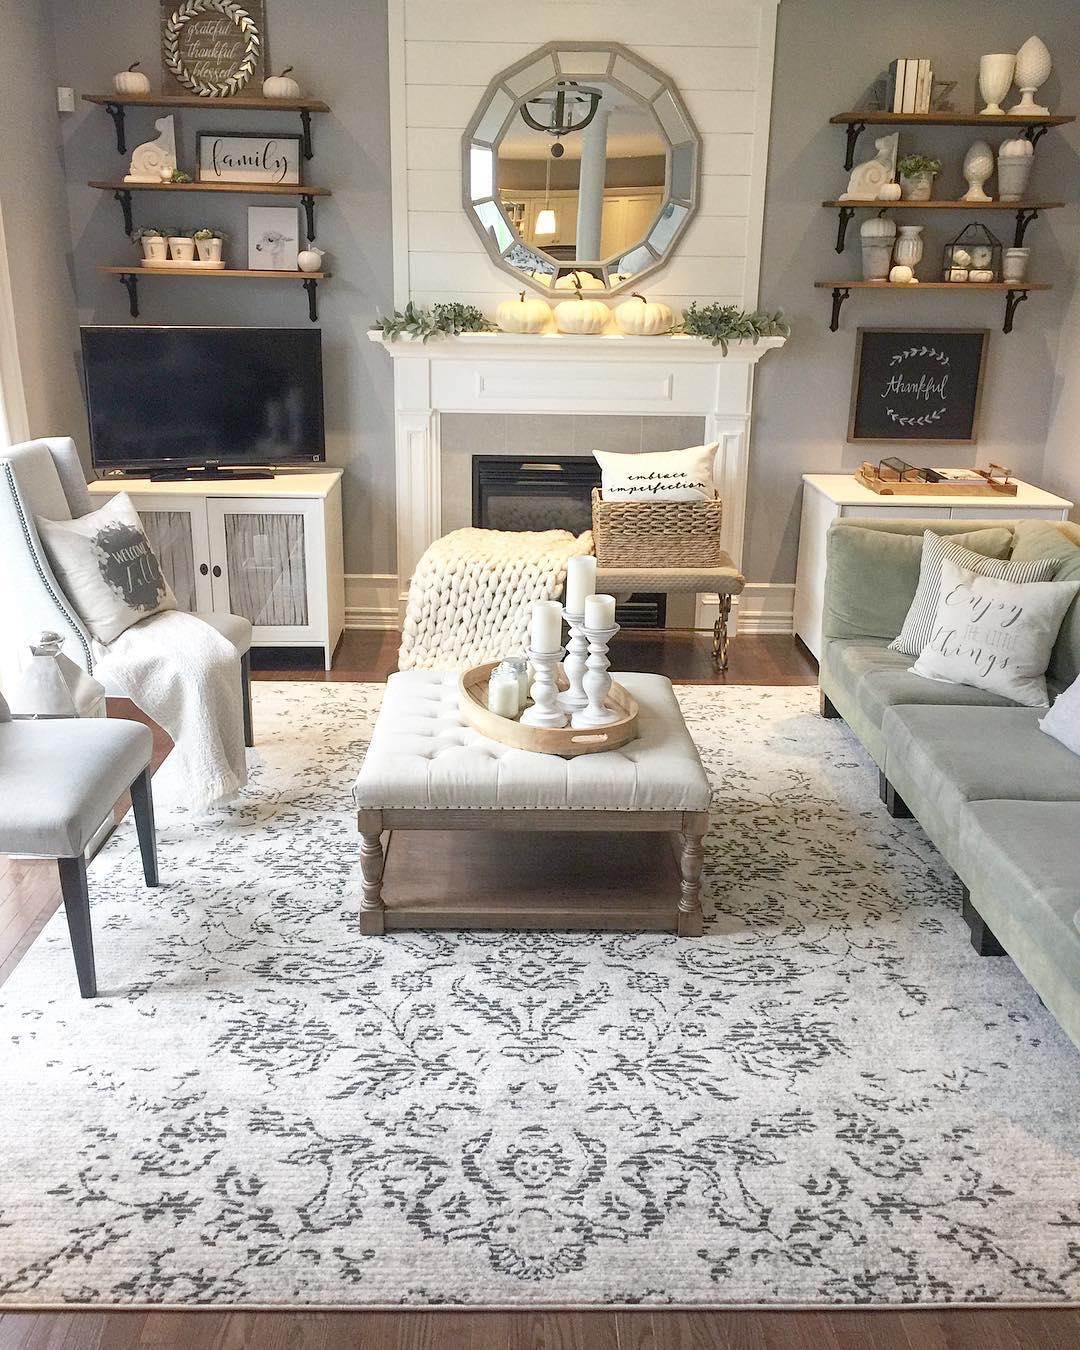 Area rug via @willowbloomhome